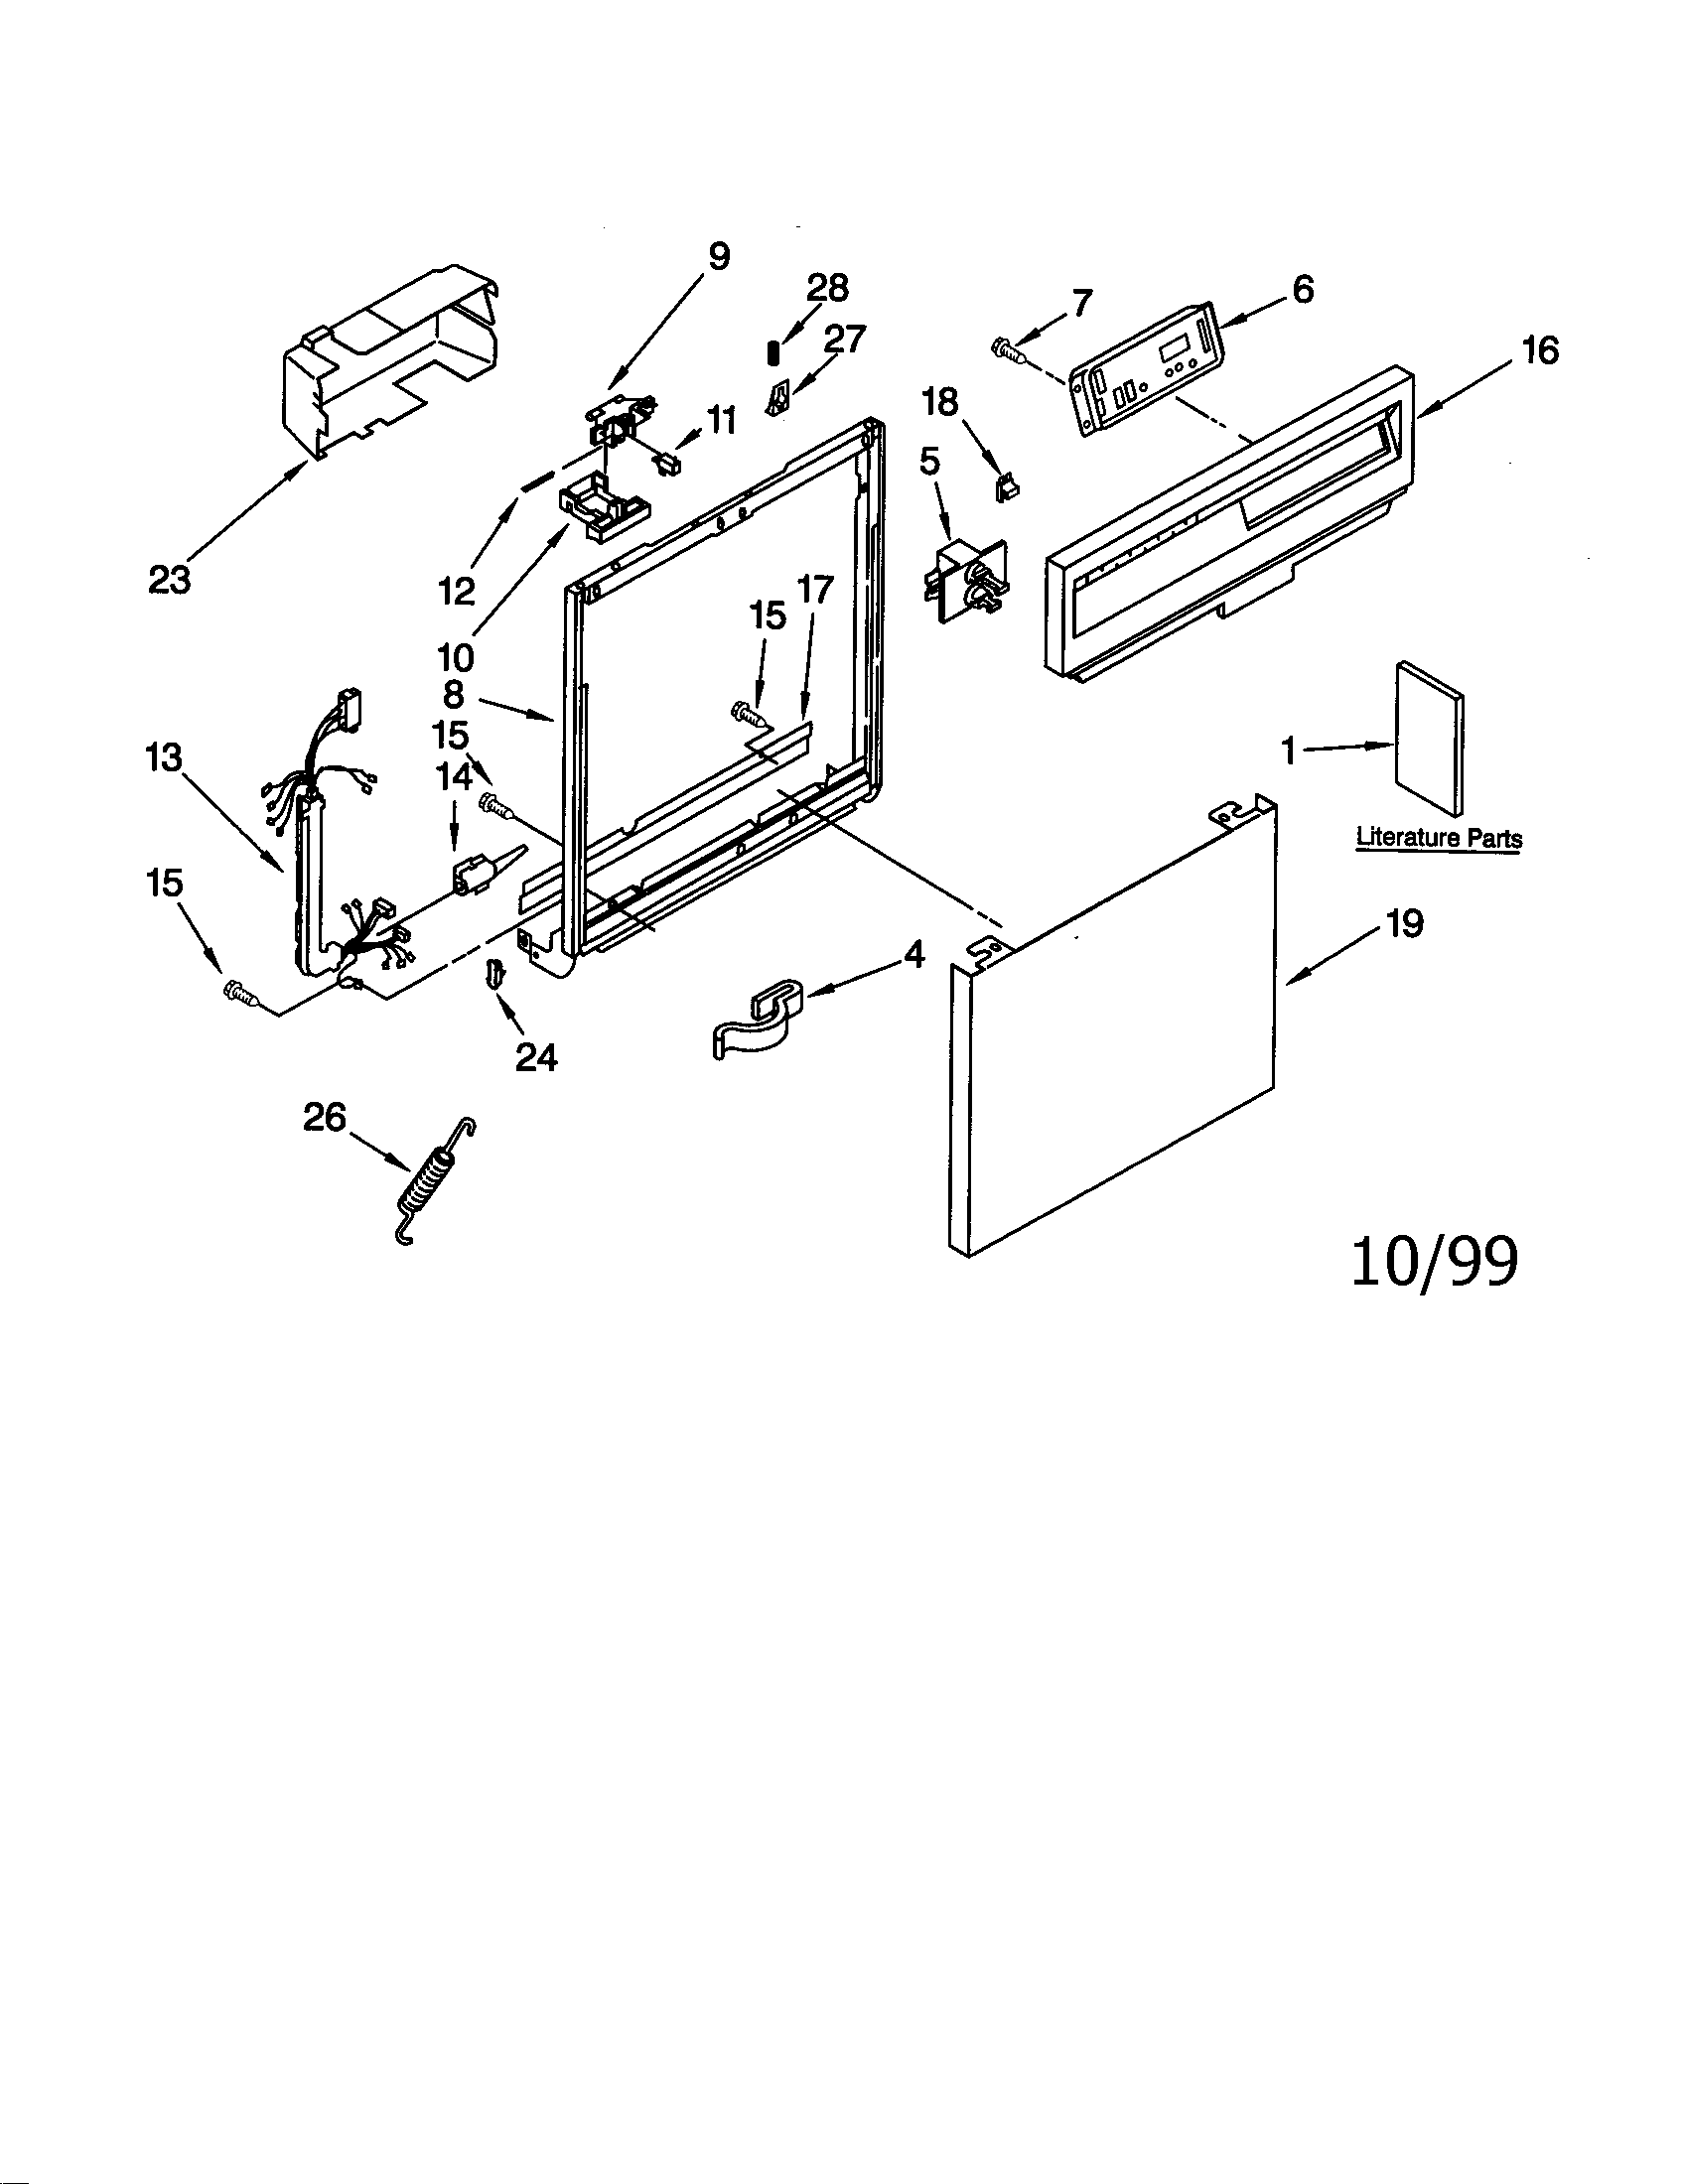 Kenmore Ultra Wash Dishwasher Parts Diagram Kenmore Dryer